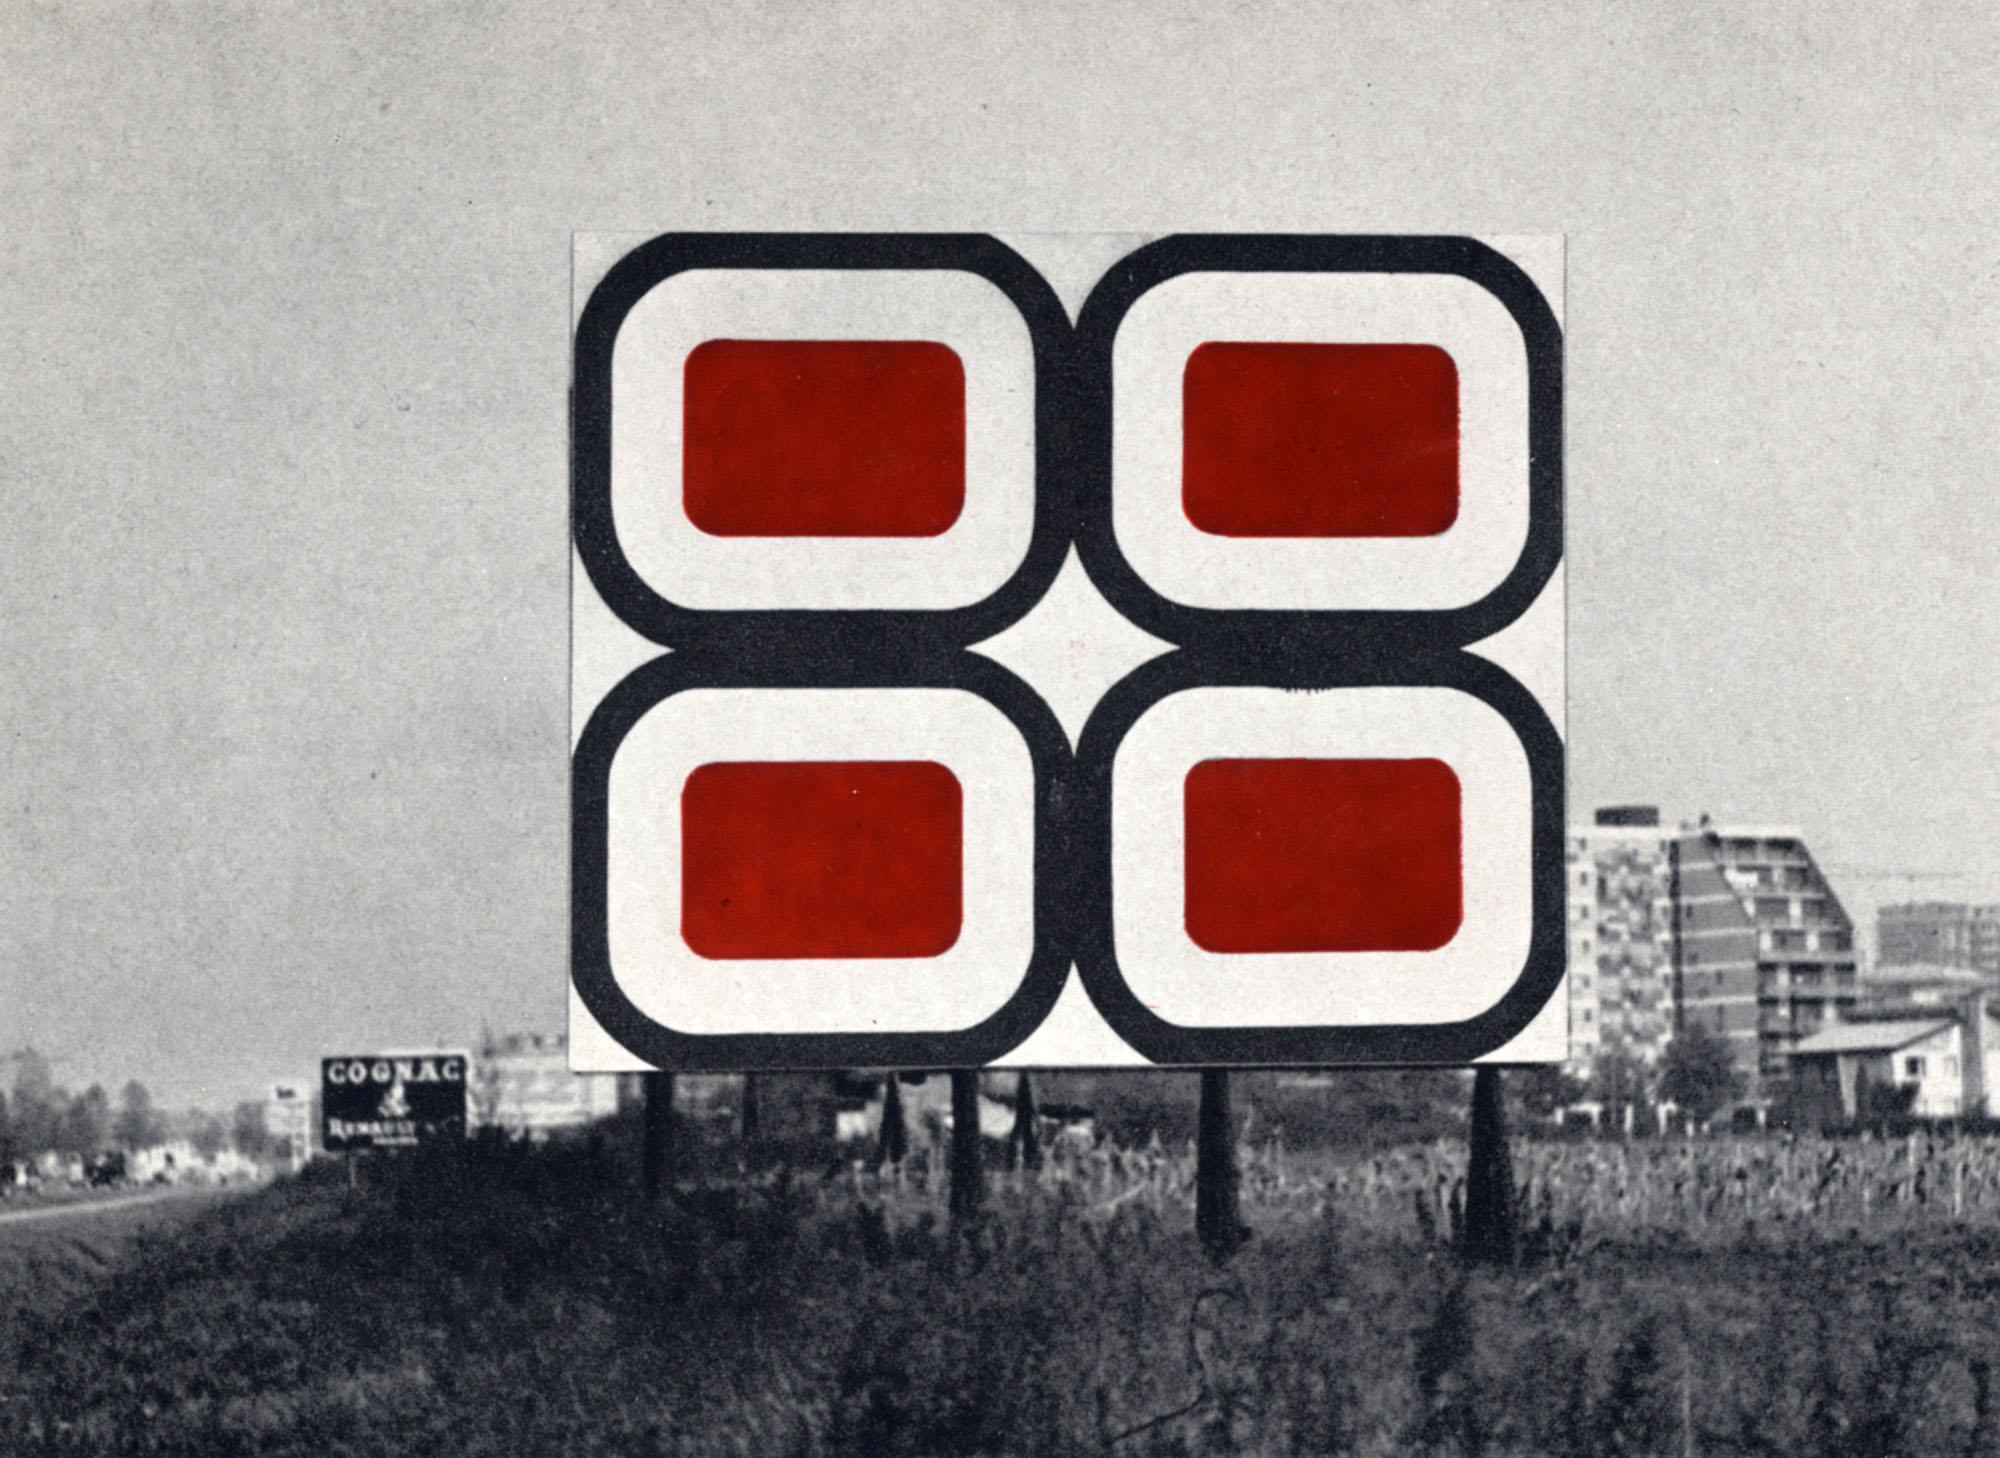 Winfred Gaul, Pannello autostrada Milano-Monza, 1962